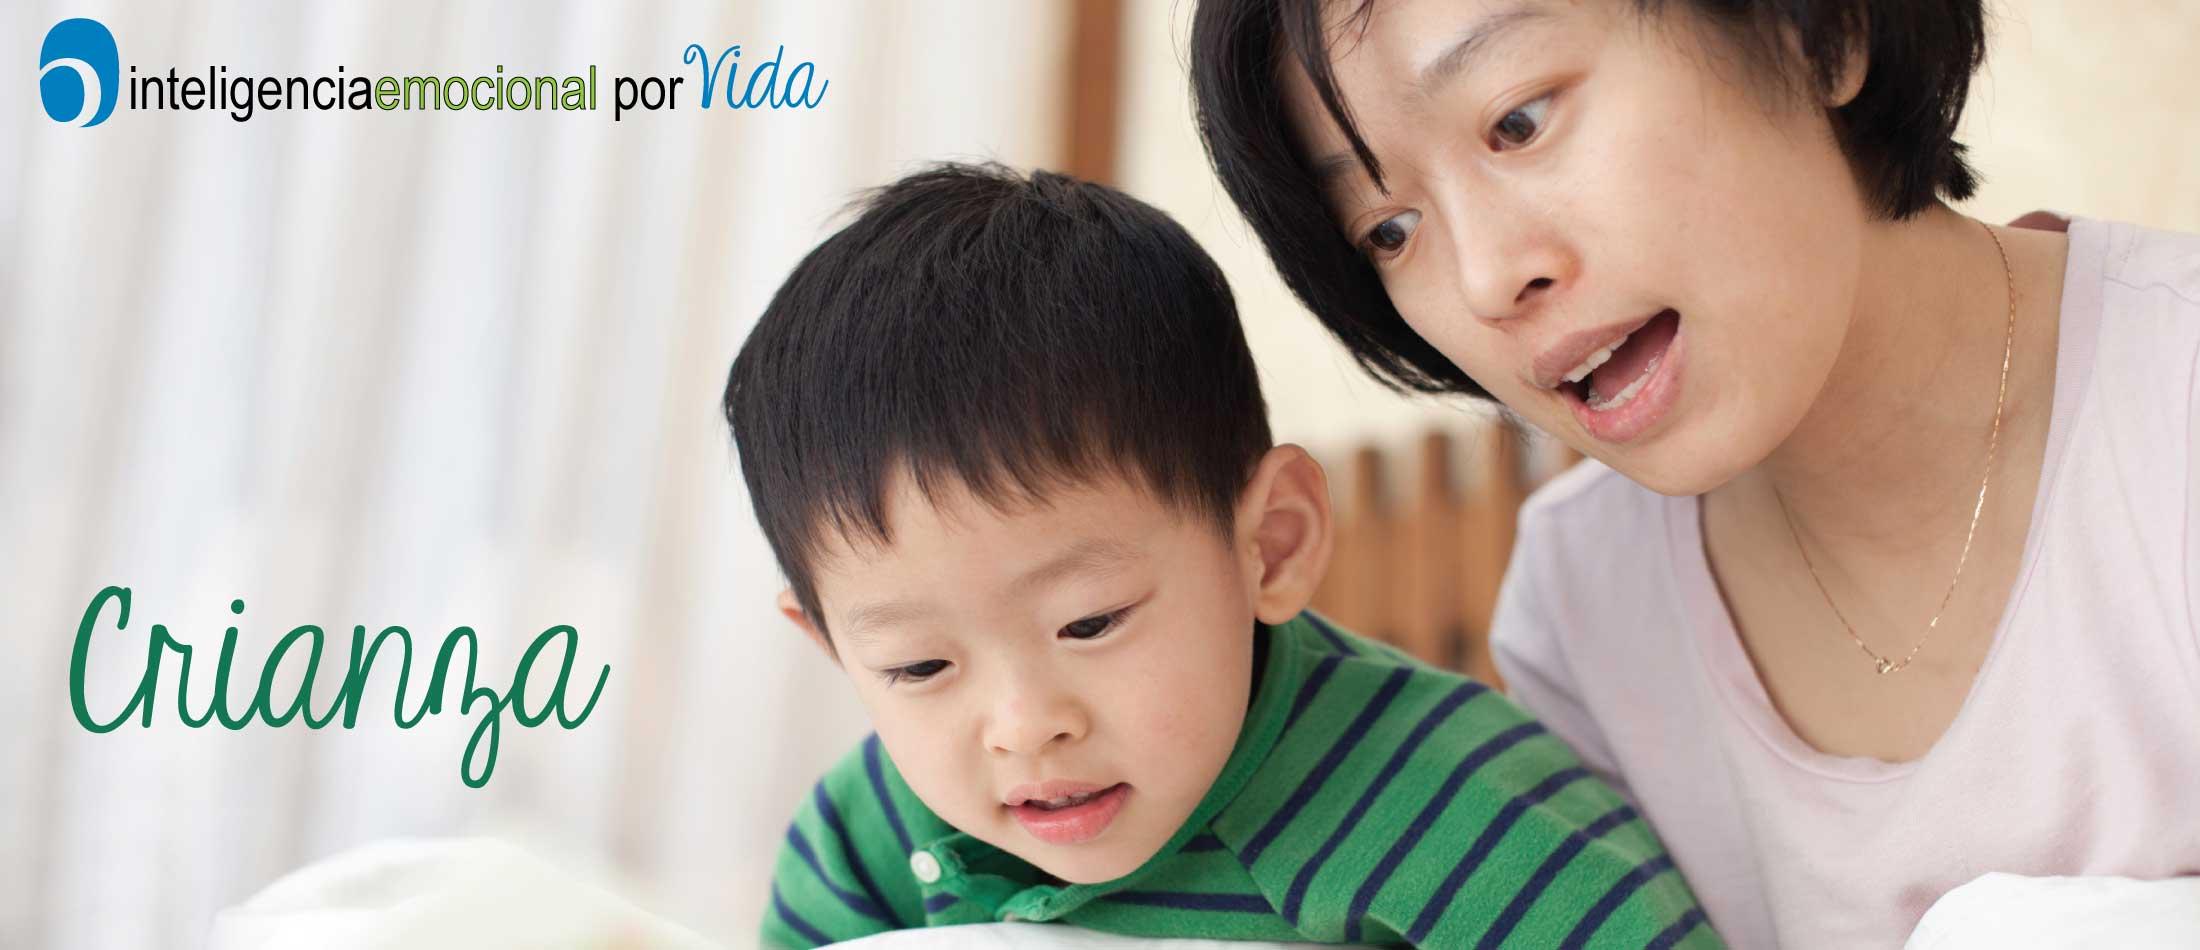 webredesign-art-spanish-parenting